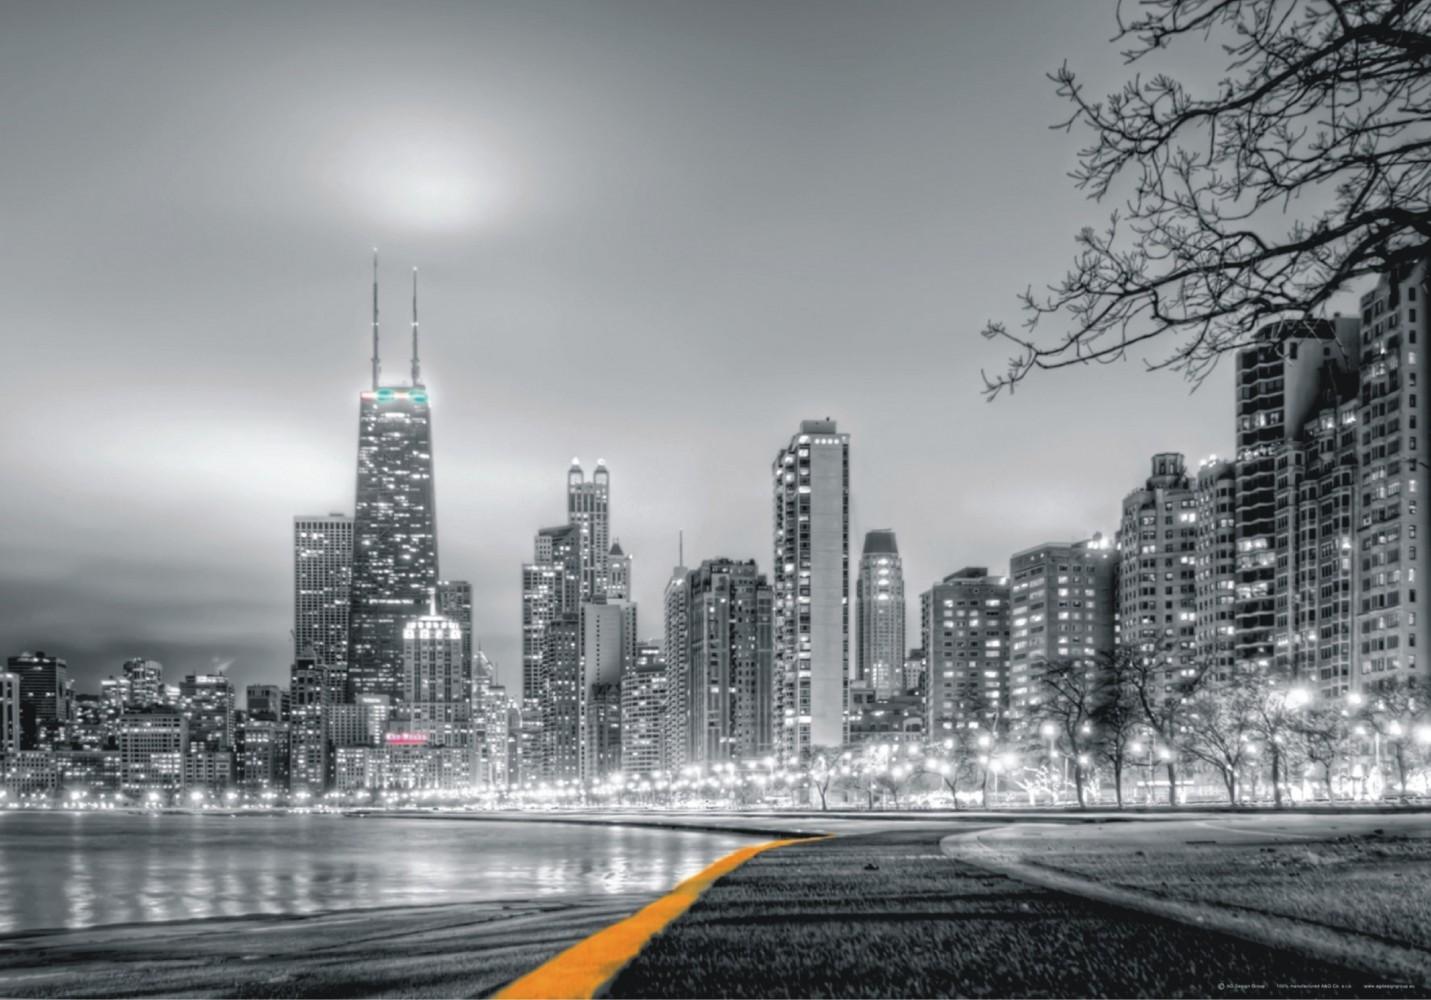 xxl poster fototapete tapete new york skyline nyv foto 160 cm x 115 cm grau ebay. Black Bedroom Furniture Sets. Home Design Ideas